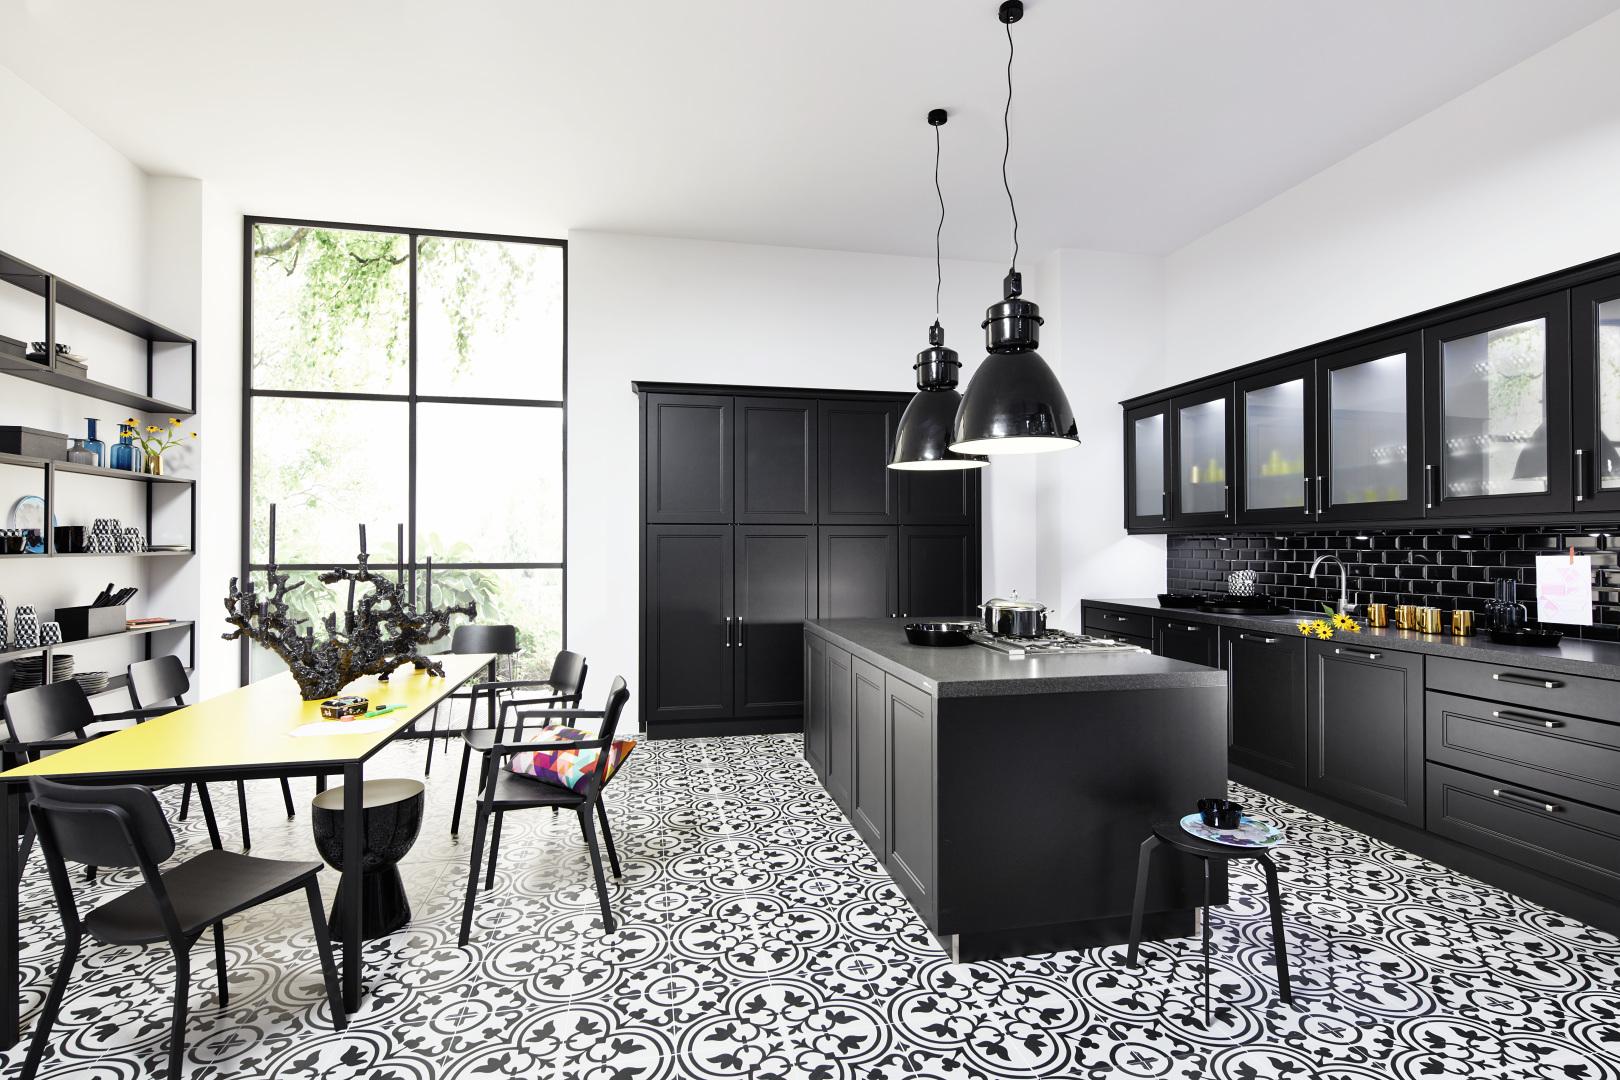 moderne landhausk che online planen kaufen k chenexperte hannover. Black Bedroom Furniture Sets. Home Design Ideas